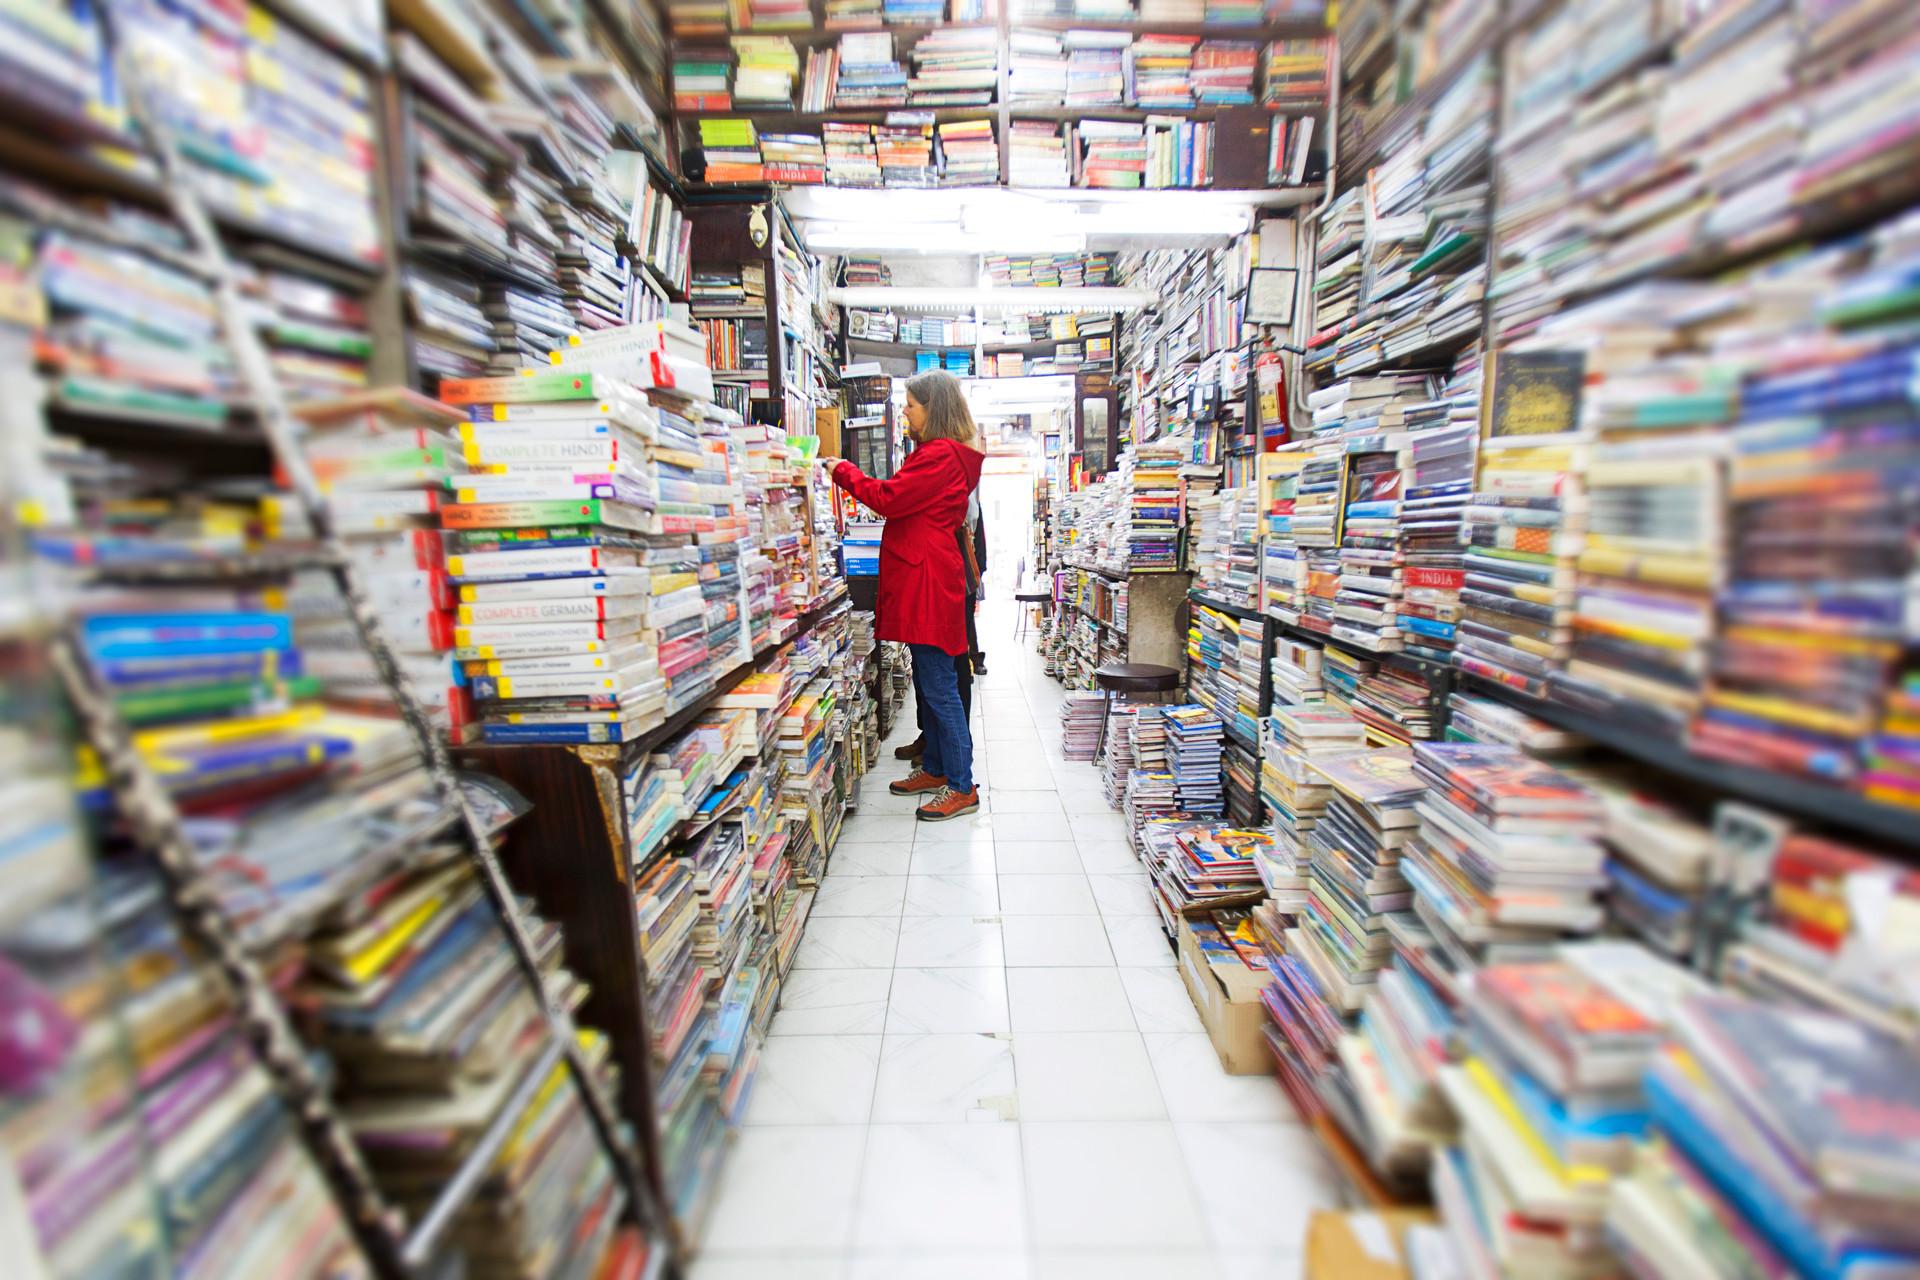 Heaving Book Shop